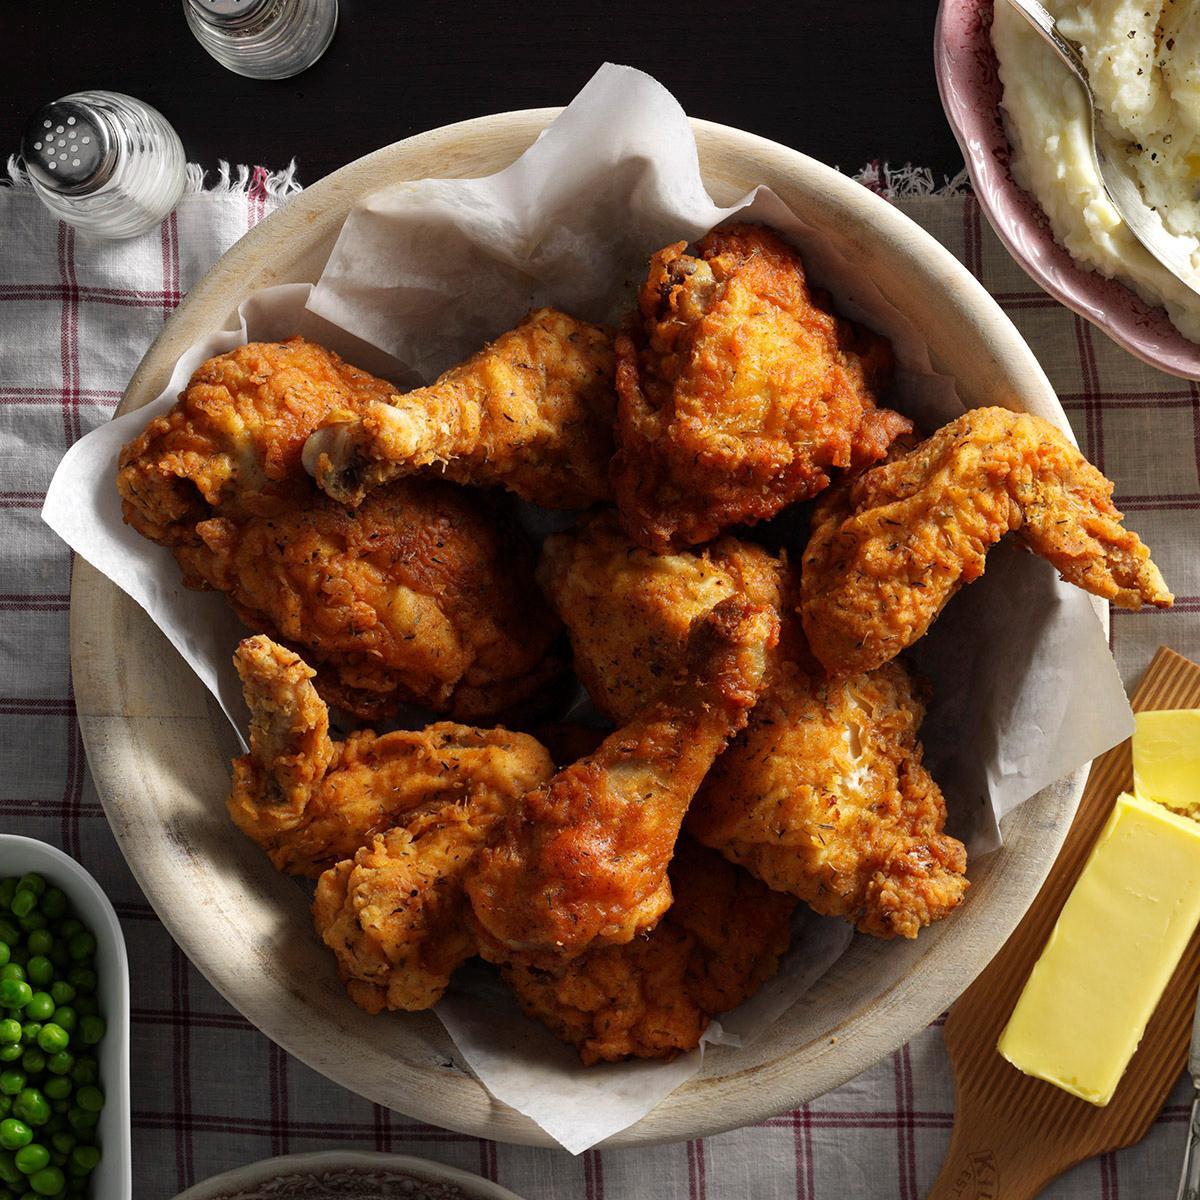 Fried Chicken Recipes  Best Ever Fried Chicken Recipe